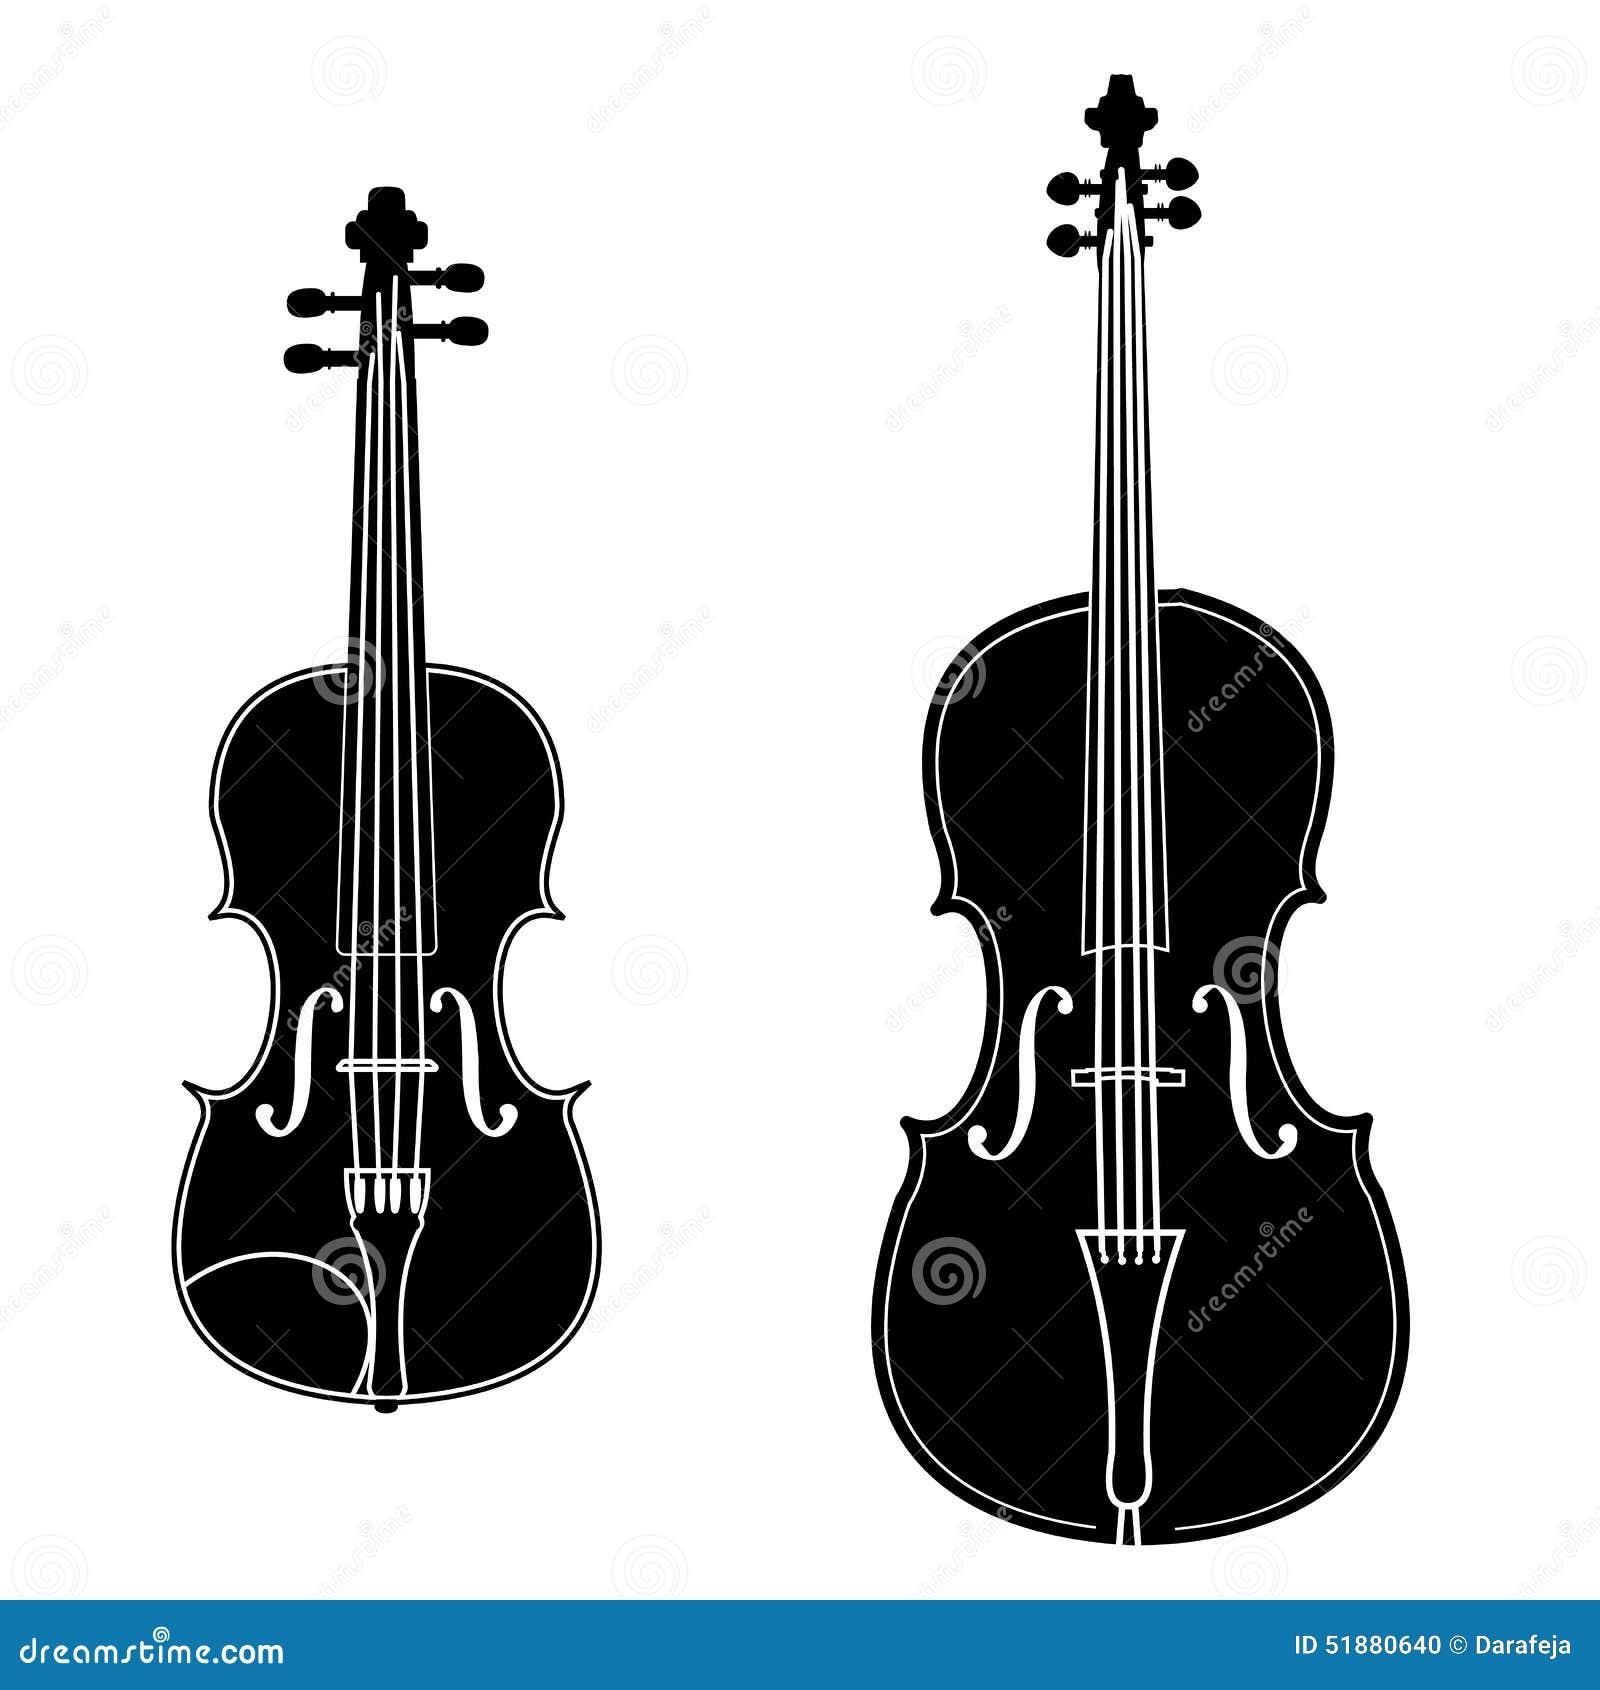 Violin Graphic Designs